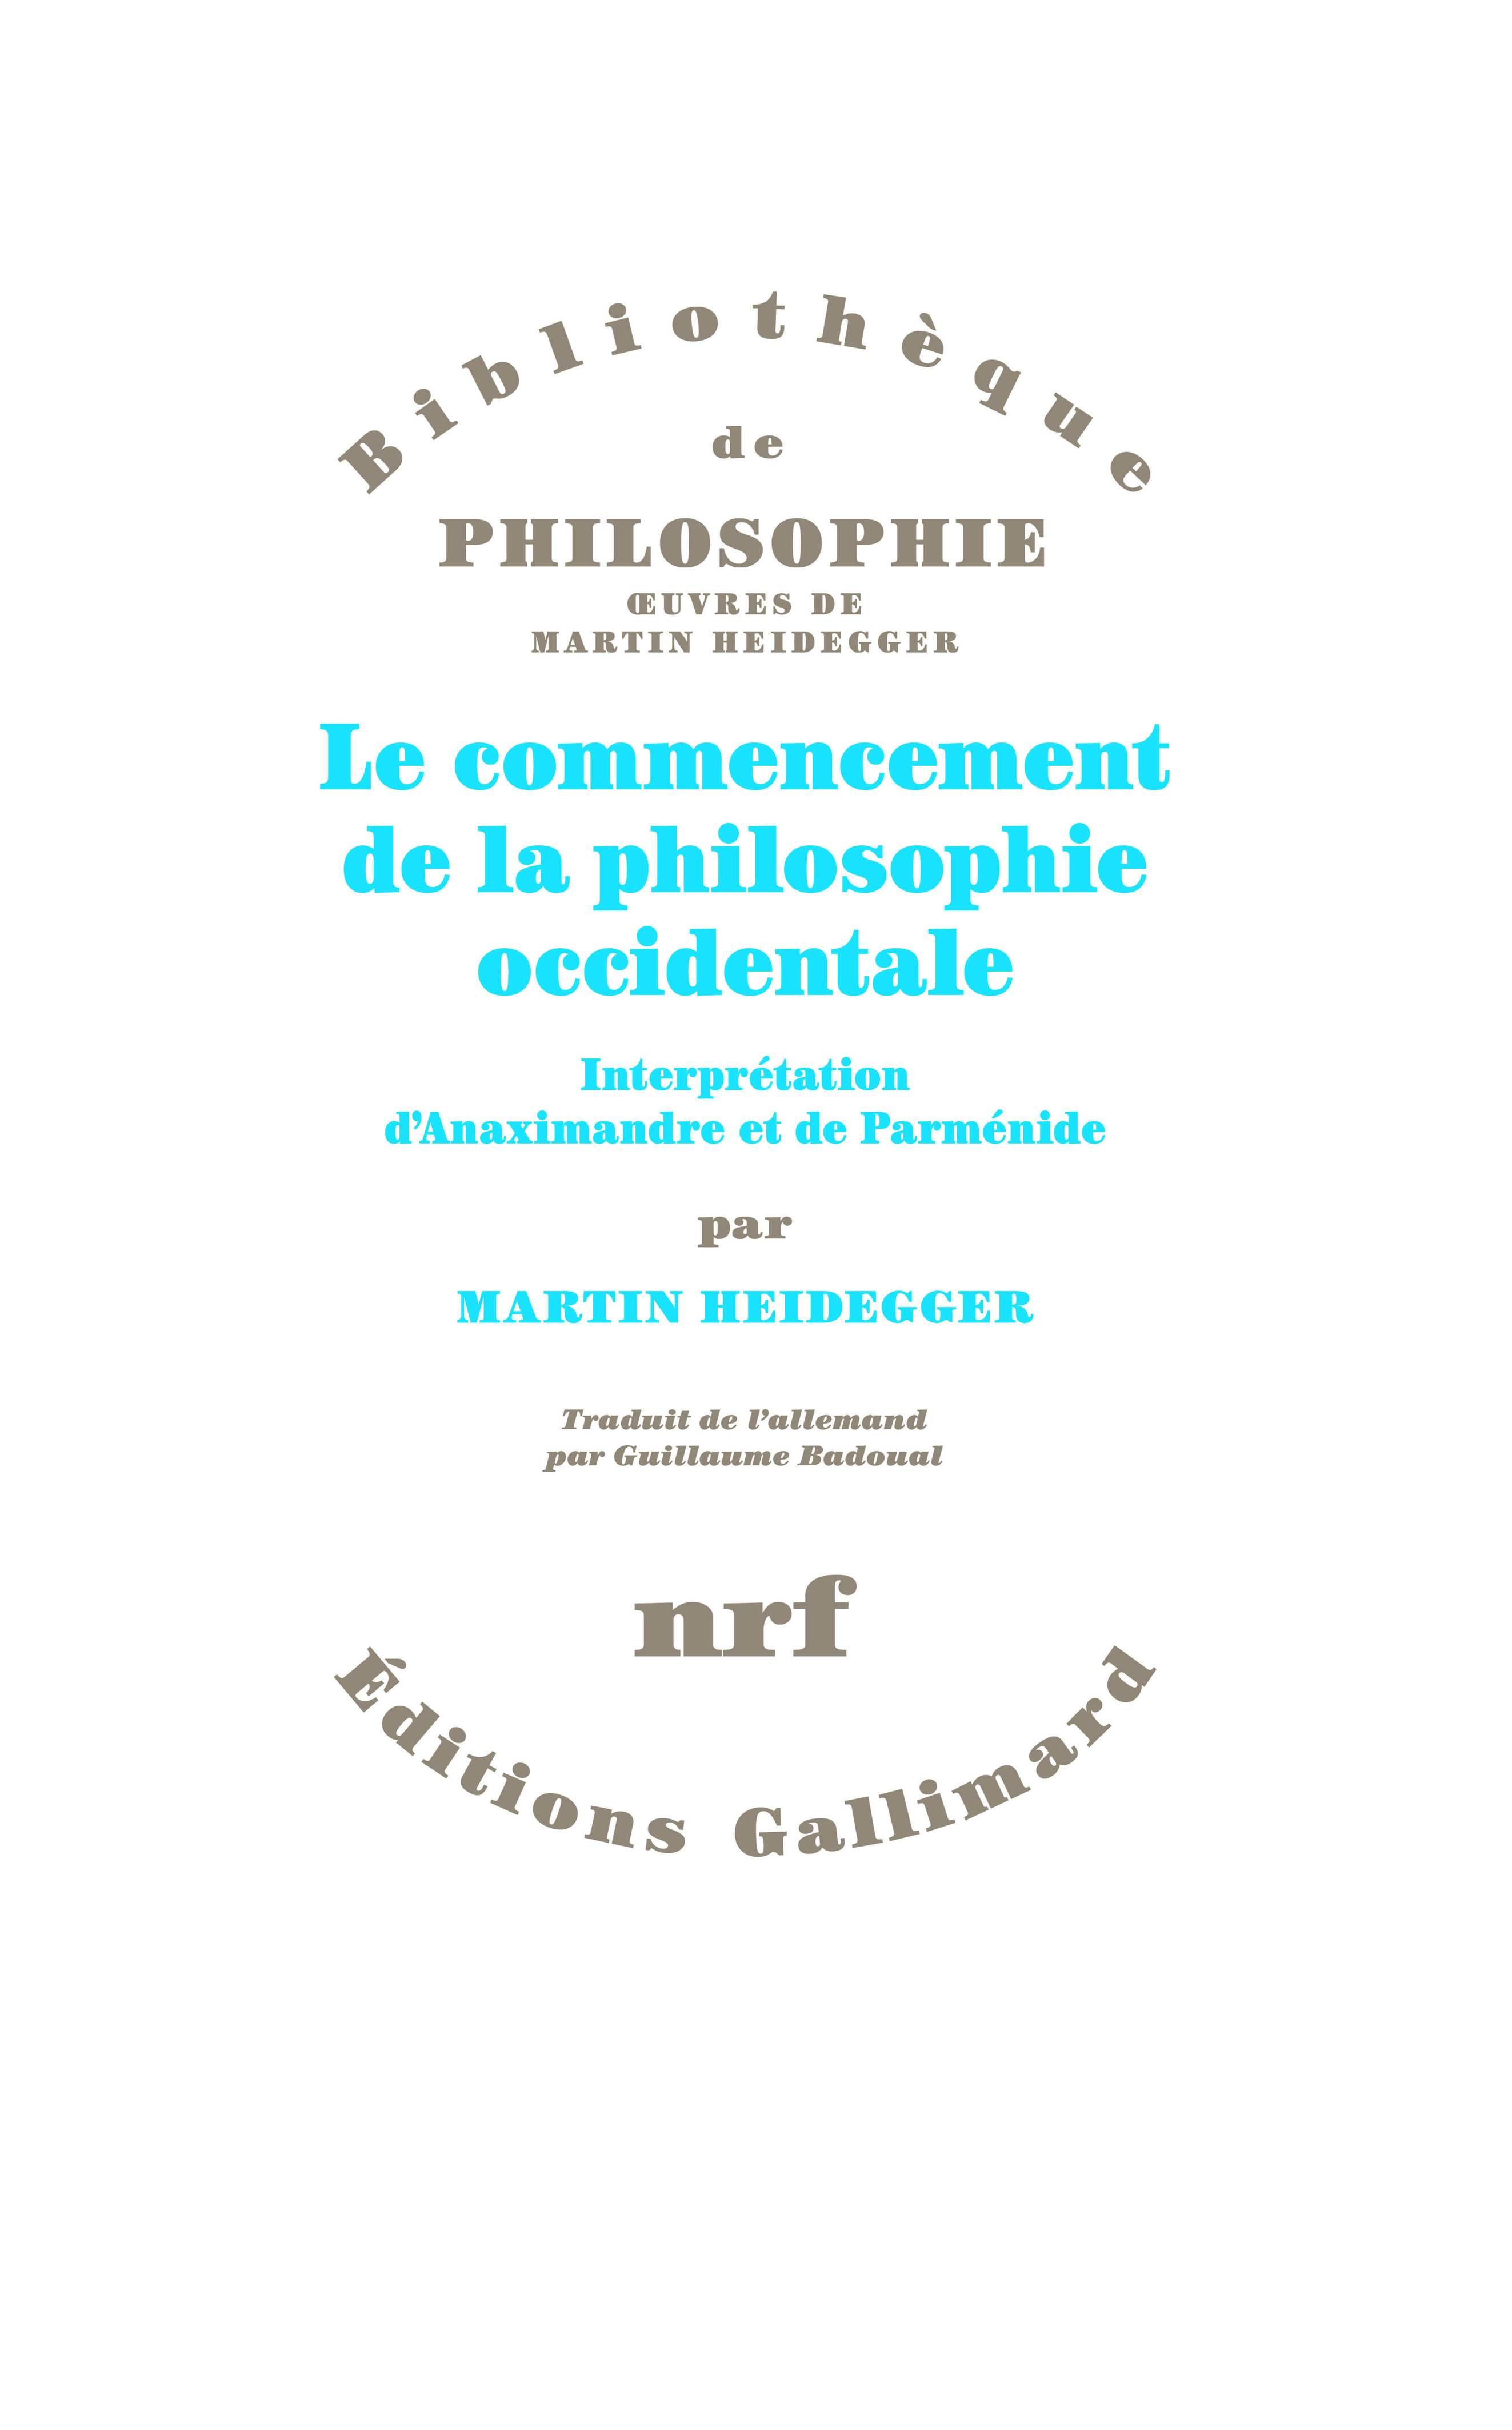 heidegger_le_commencement_de_la_philosophie_occidentale.jpg